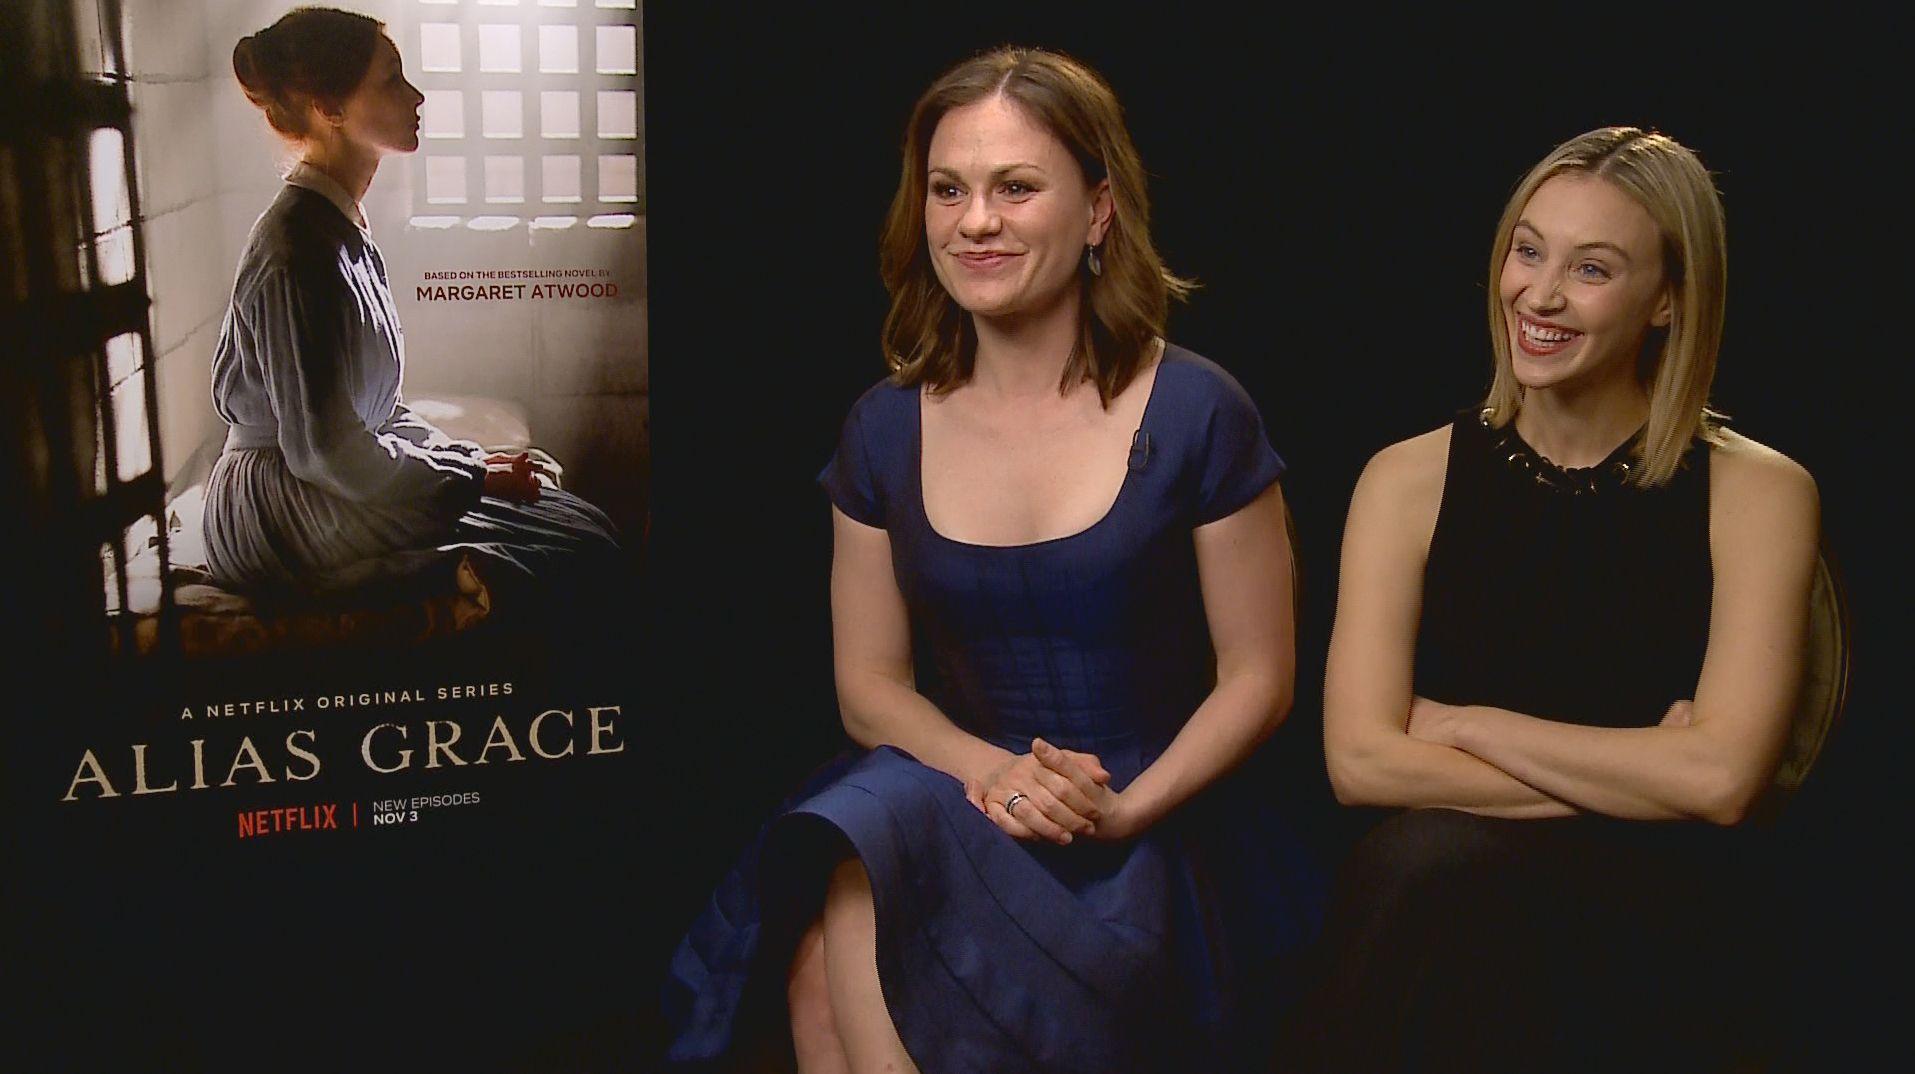 Anna Paquin Sarah Gadon On David Cronenbergs Alias Grace